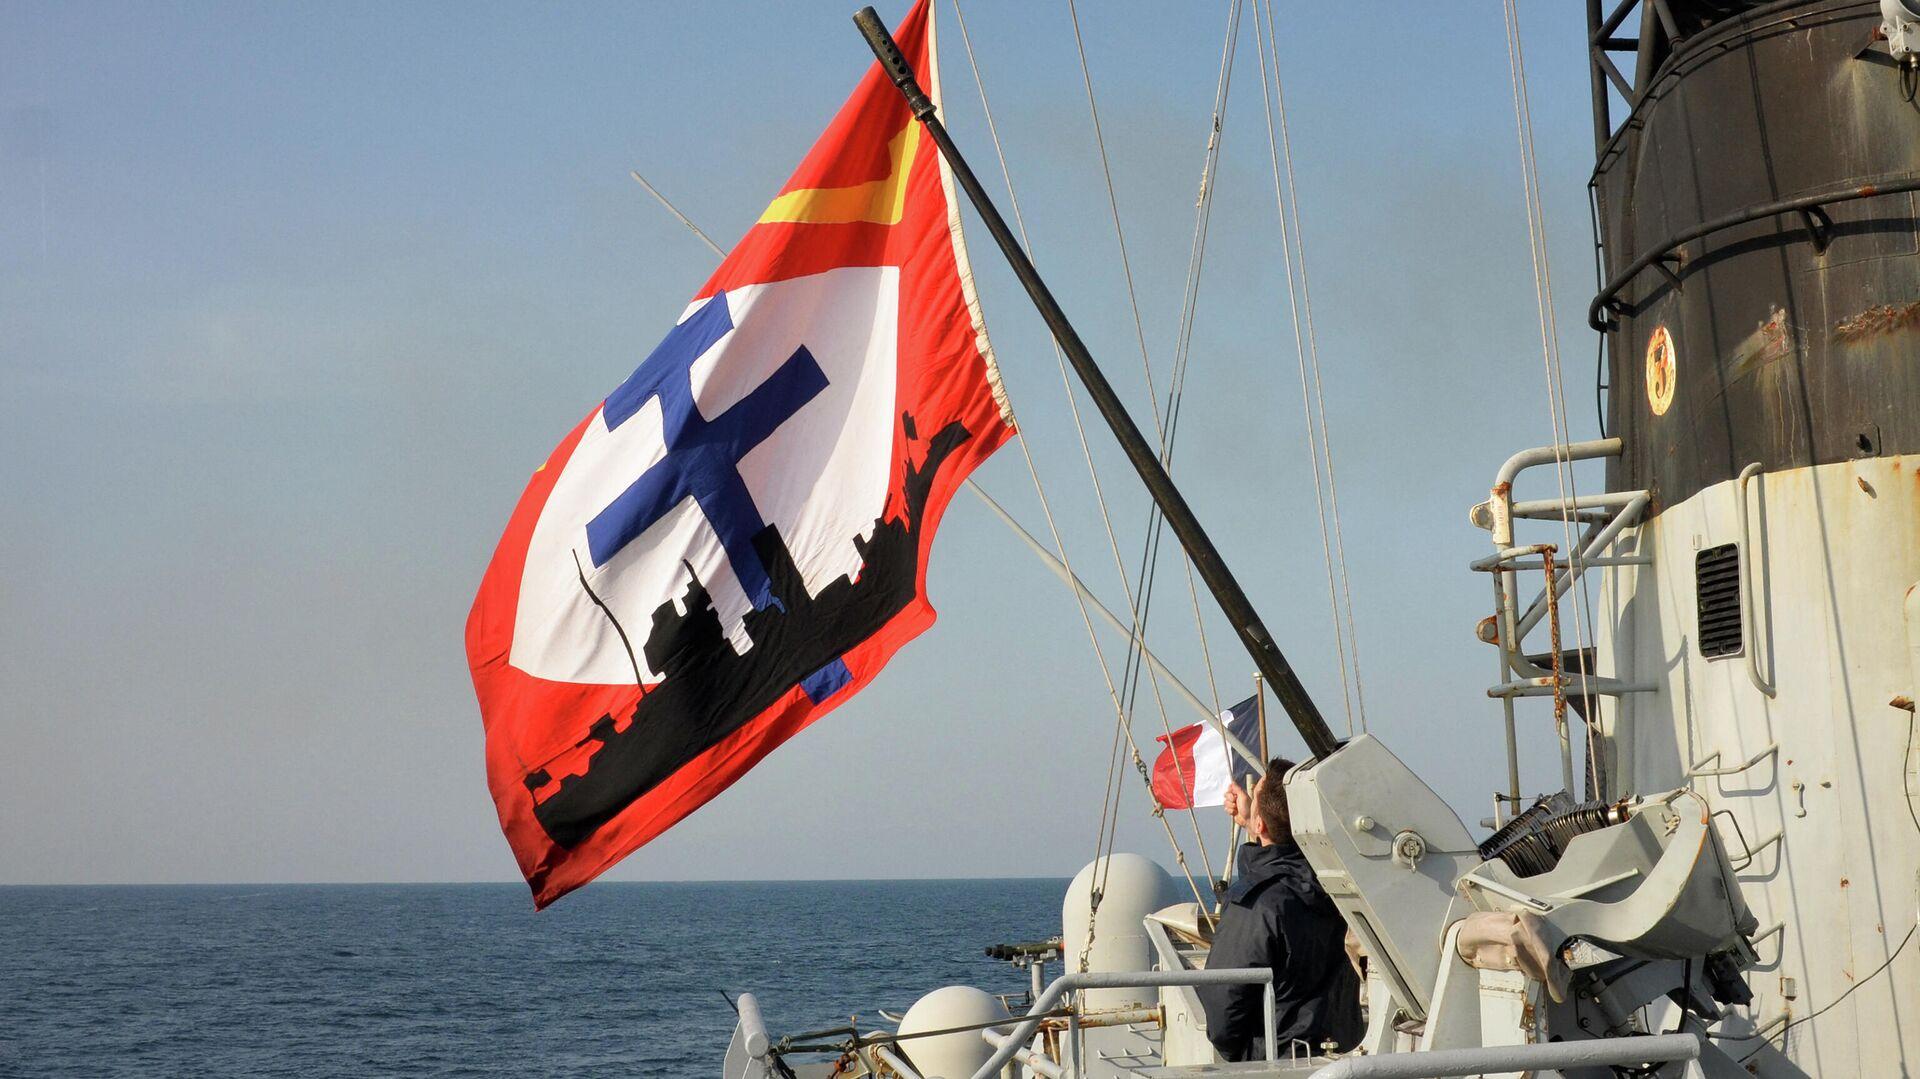 Корабль Командан Биро ВМС Франции в Черном море - РИА Новости, 1920, 11.05.2021